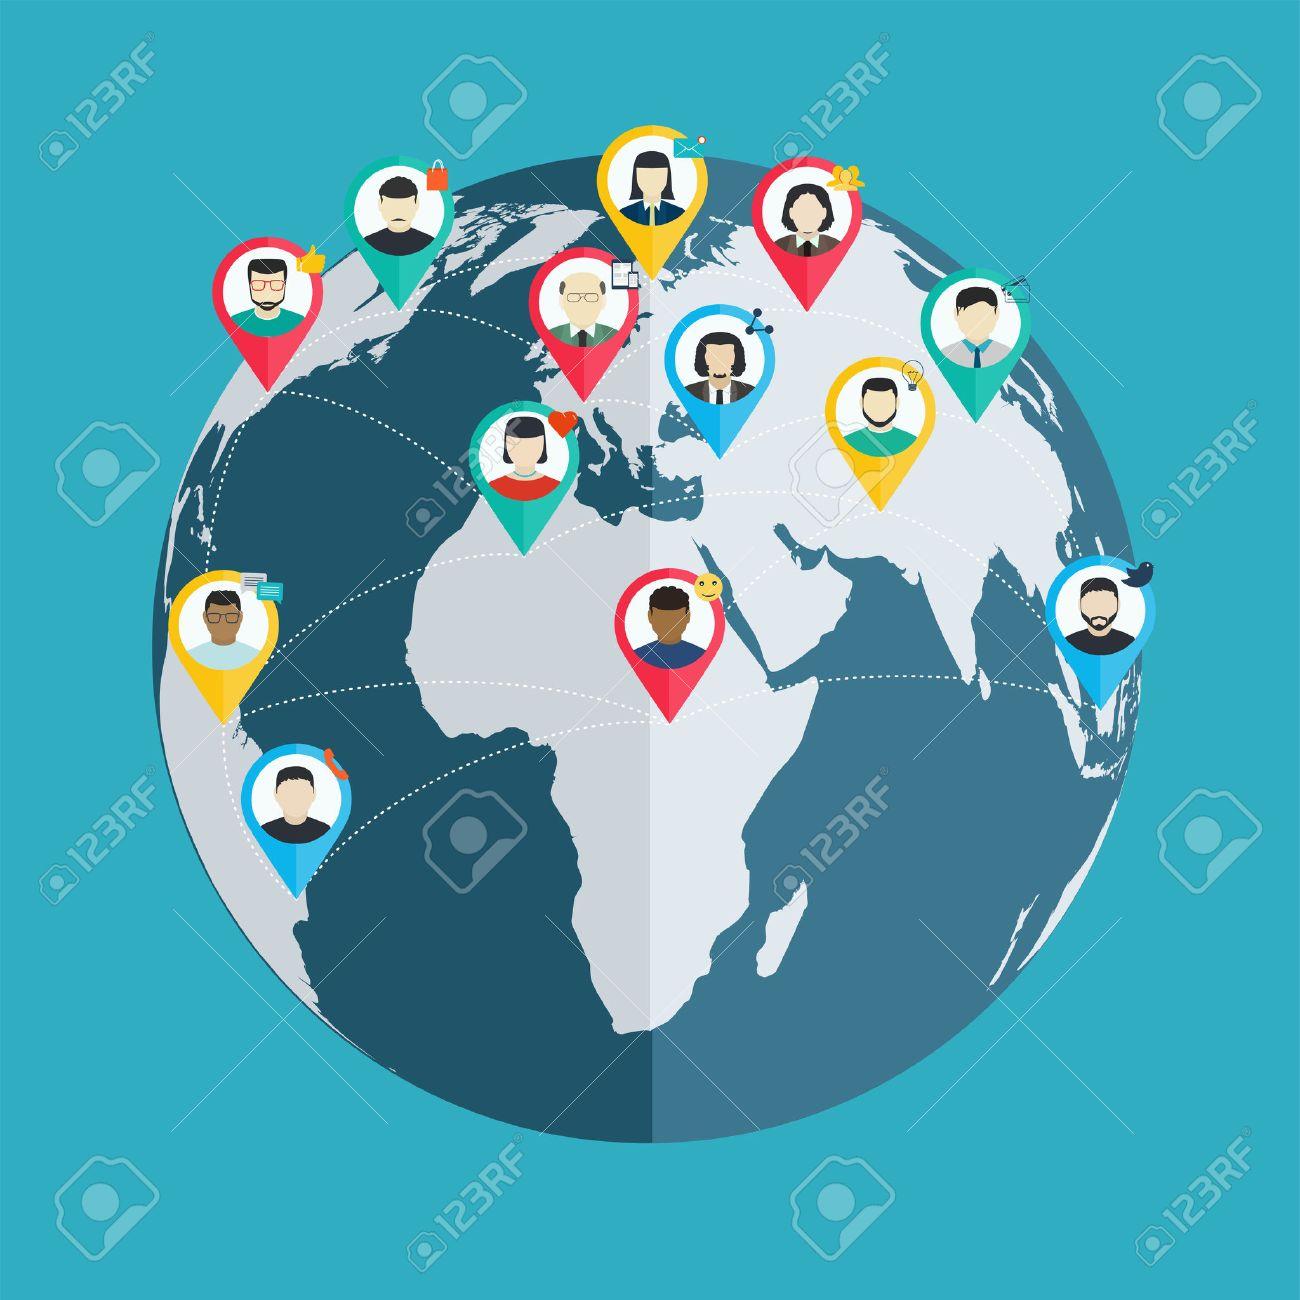 around the world app